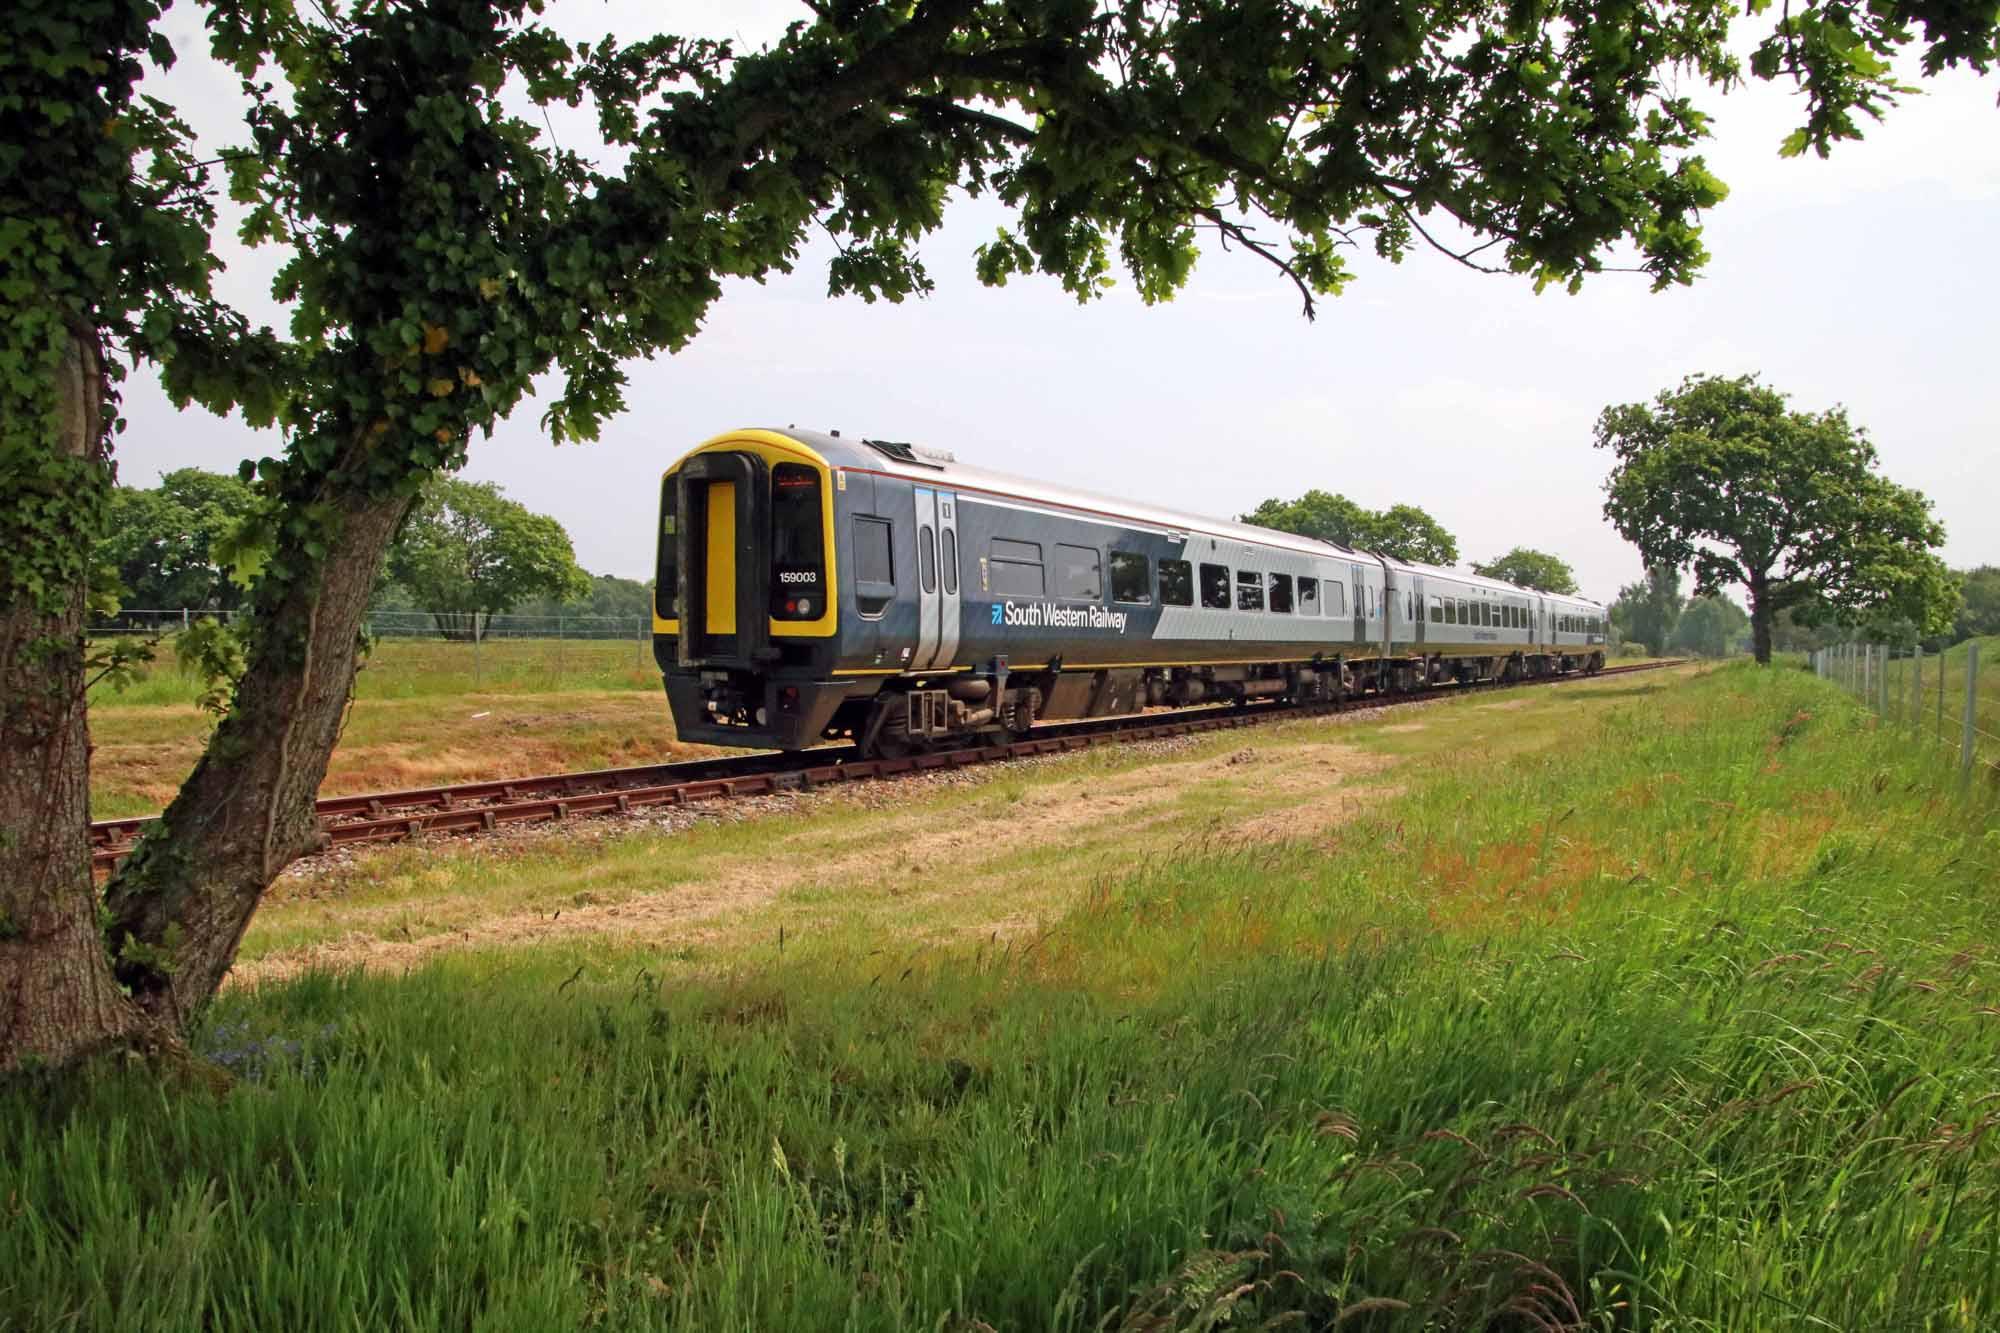 South Western Railway celebrates World Environment Day 2019